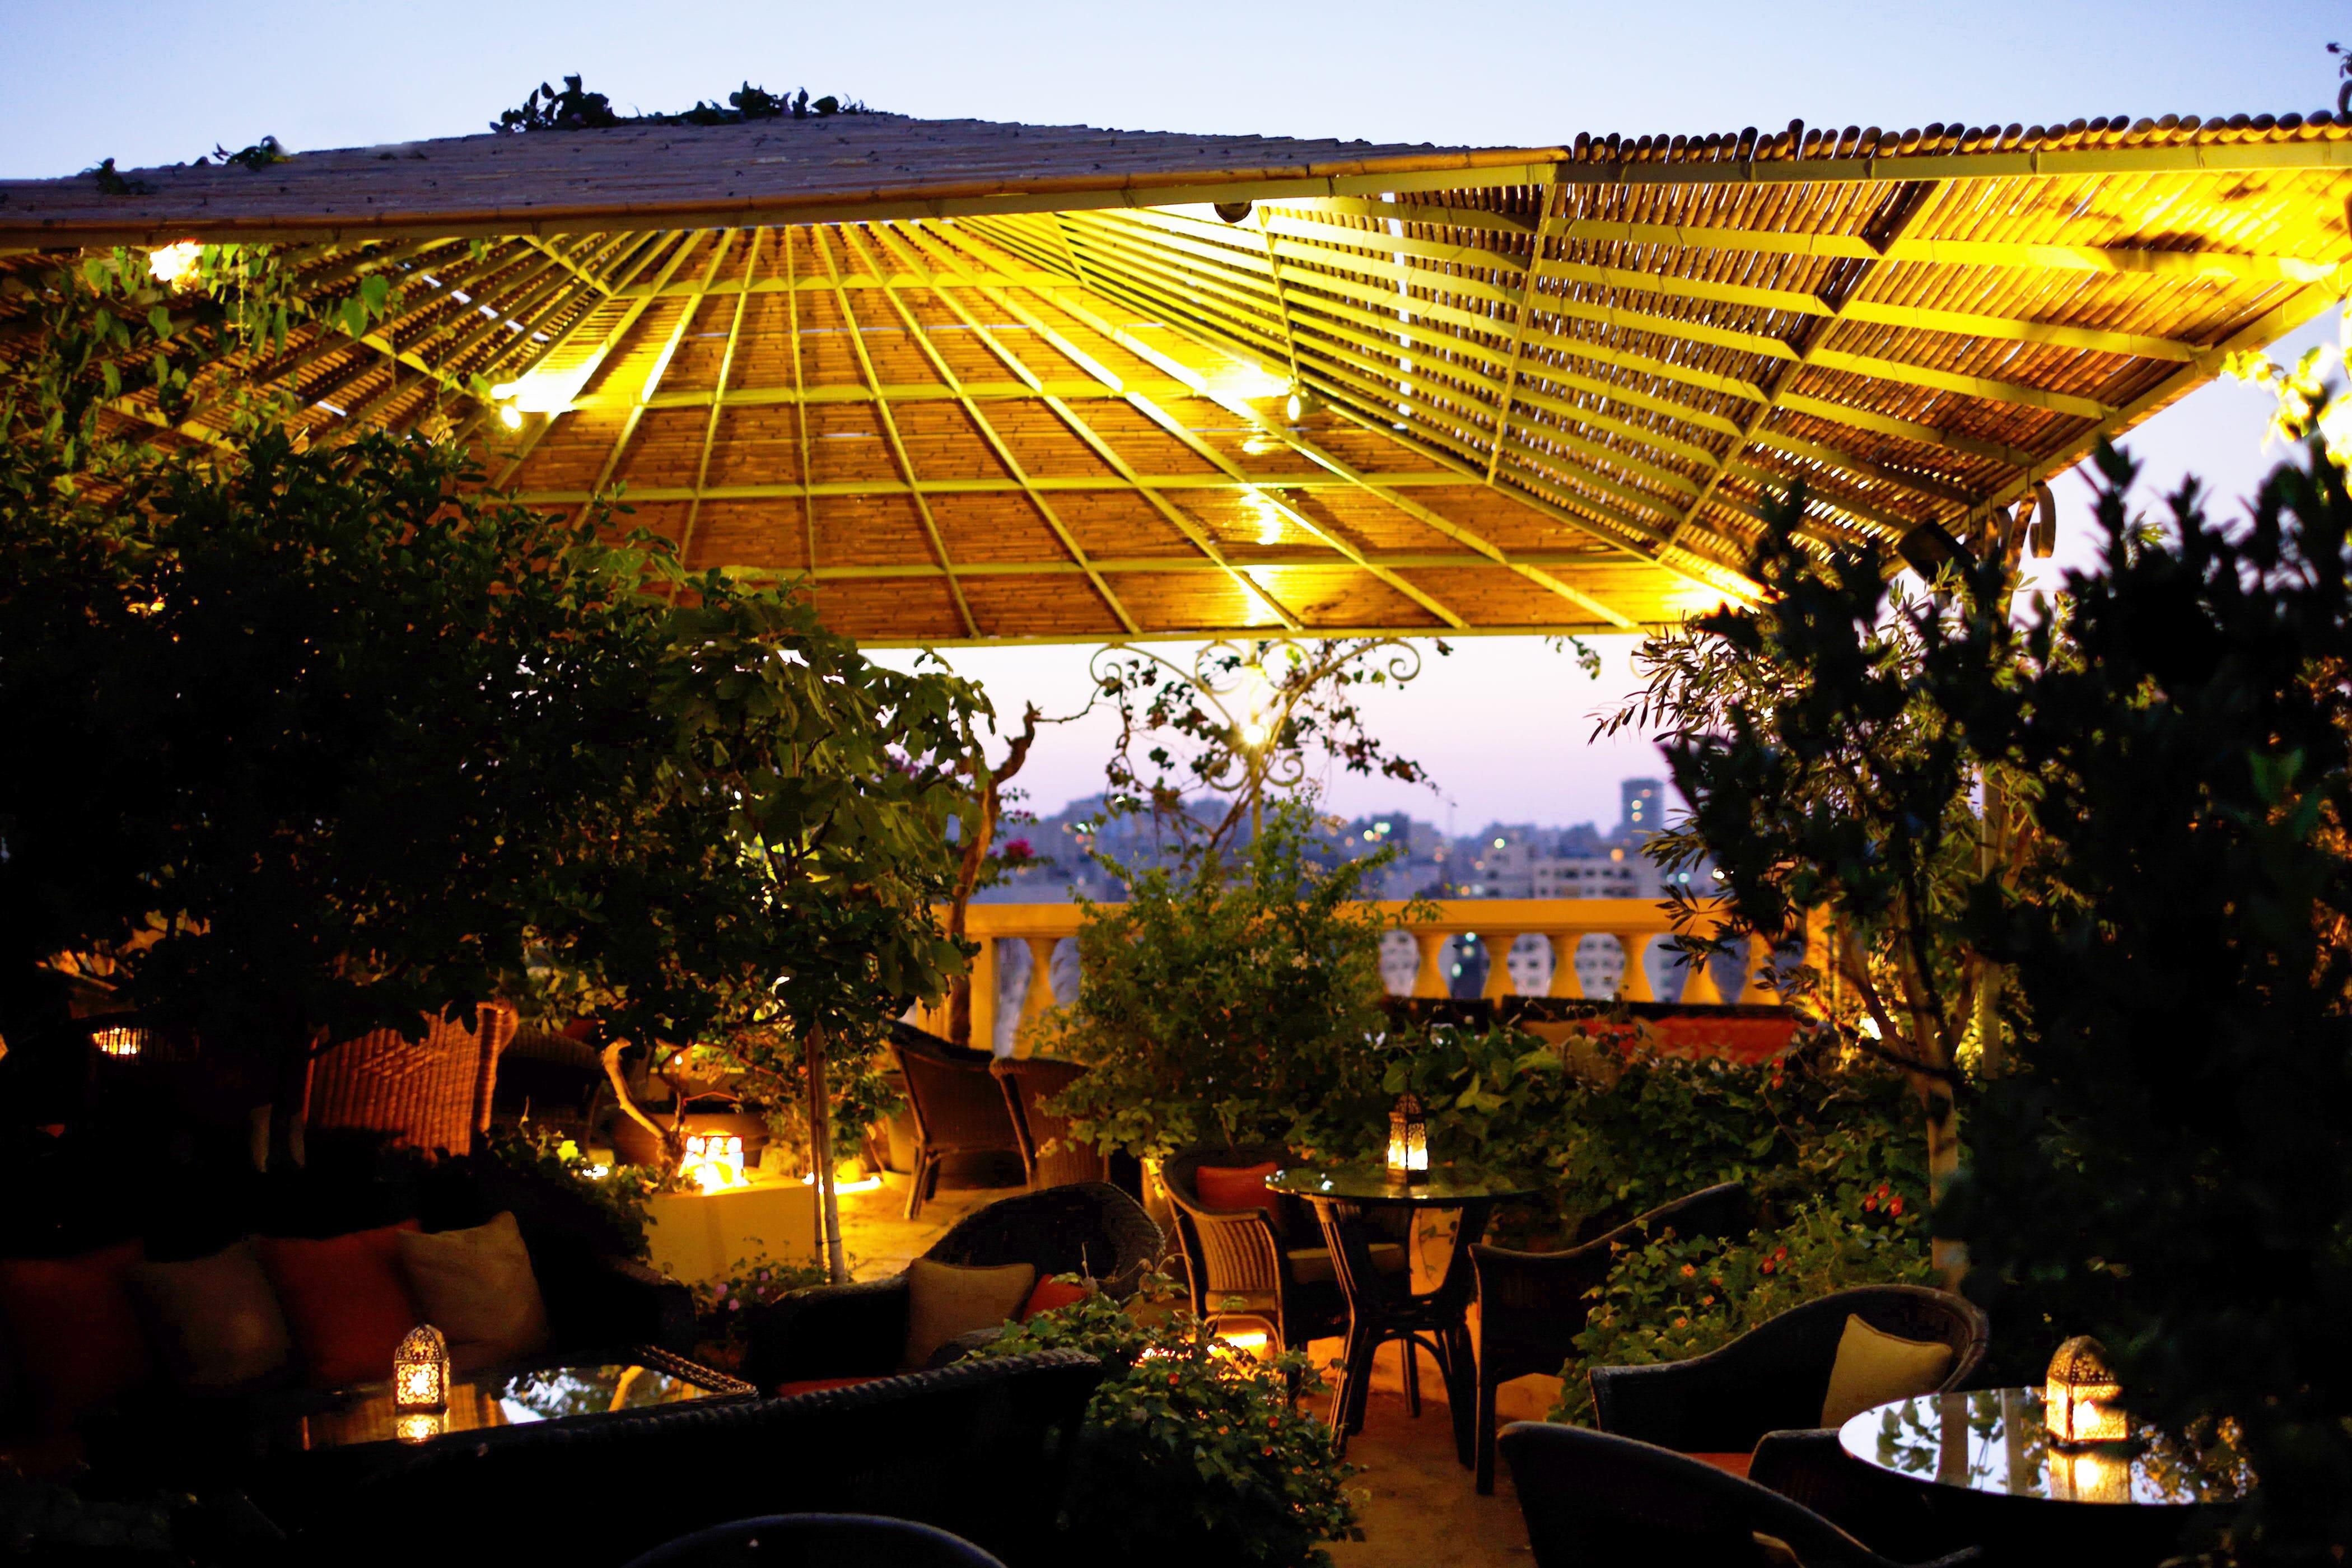 Night Terrace, Albergo Hotel   Courtesy of Albergo Hotel